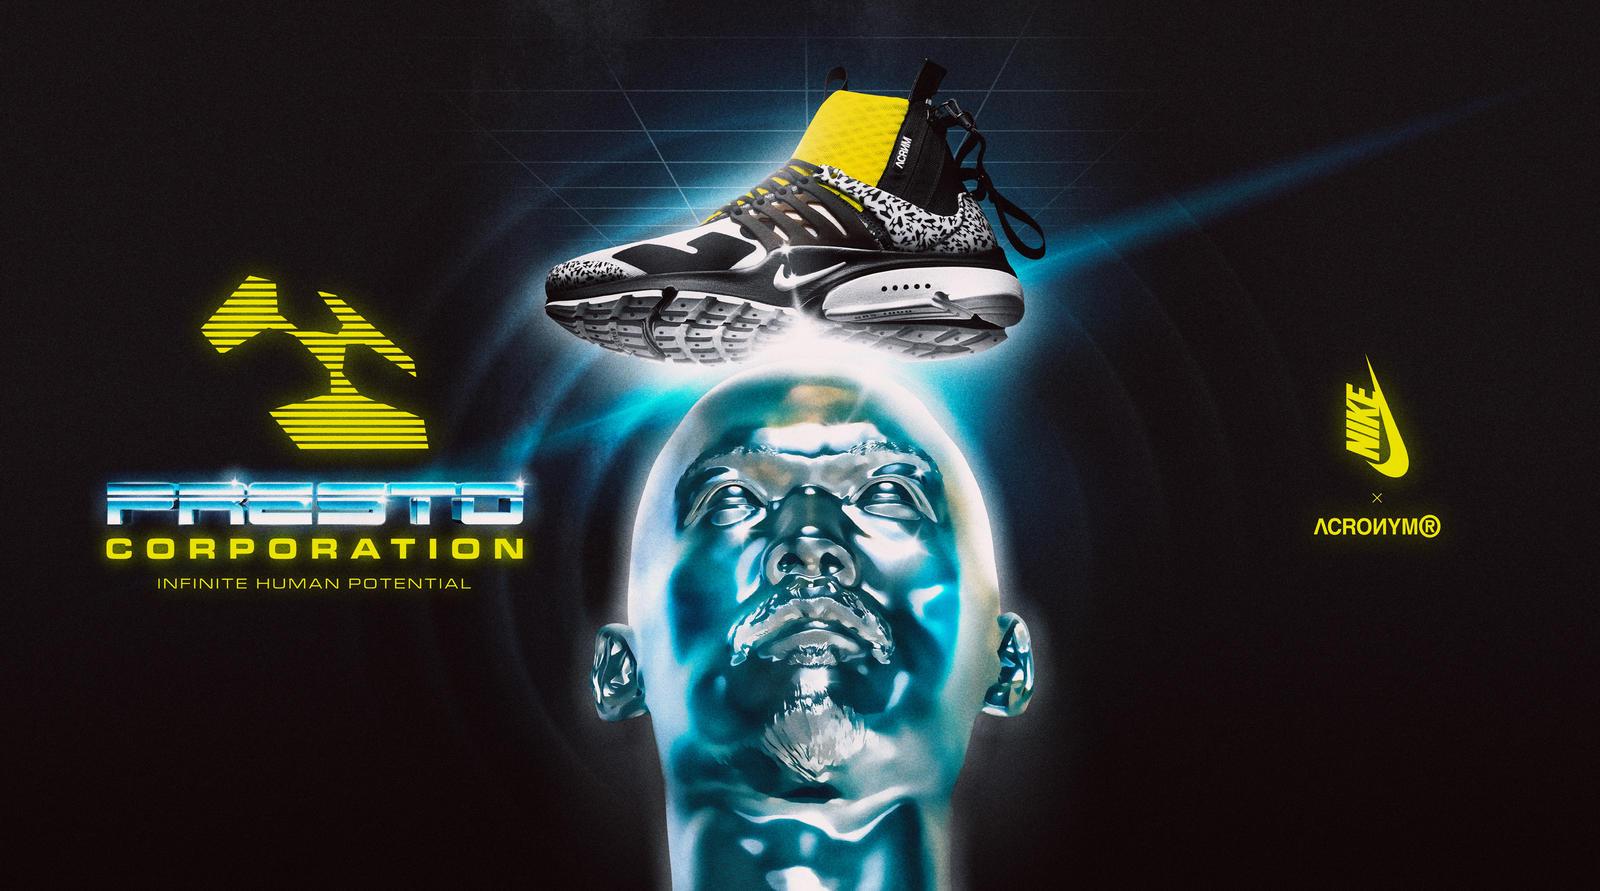 New Nike Vapormax 2018,Nike New Flyknit 2018,843 800 Nike Air VaporMax Flyknit 2.0 W Premium Probability II Generation Air Max